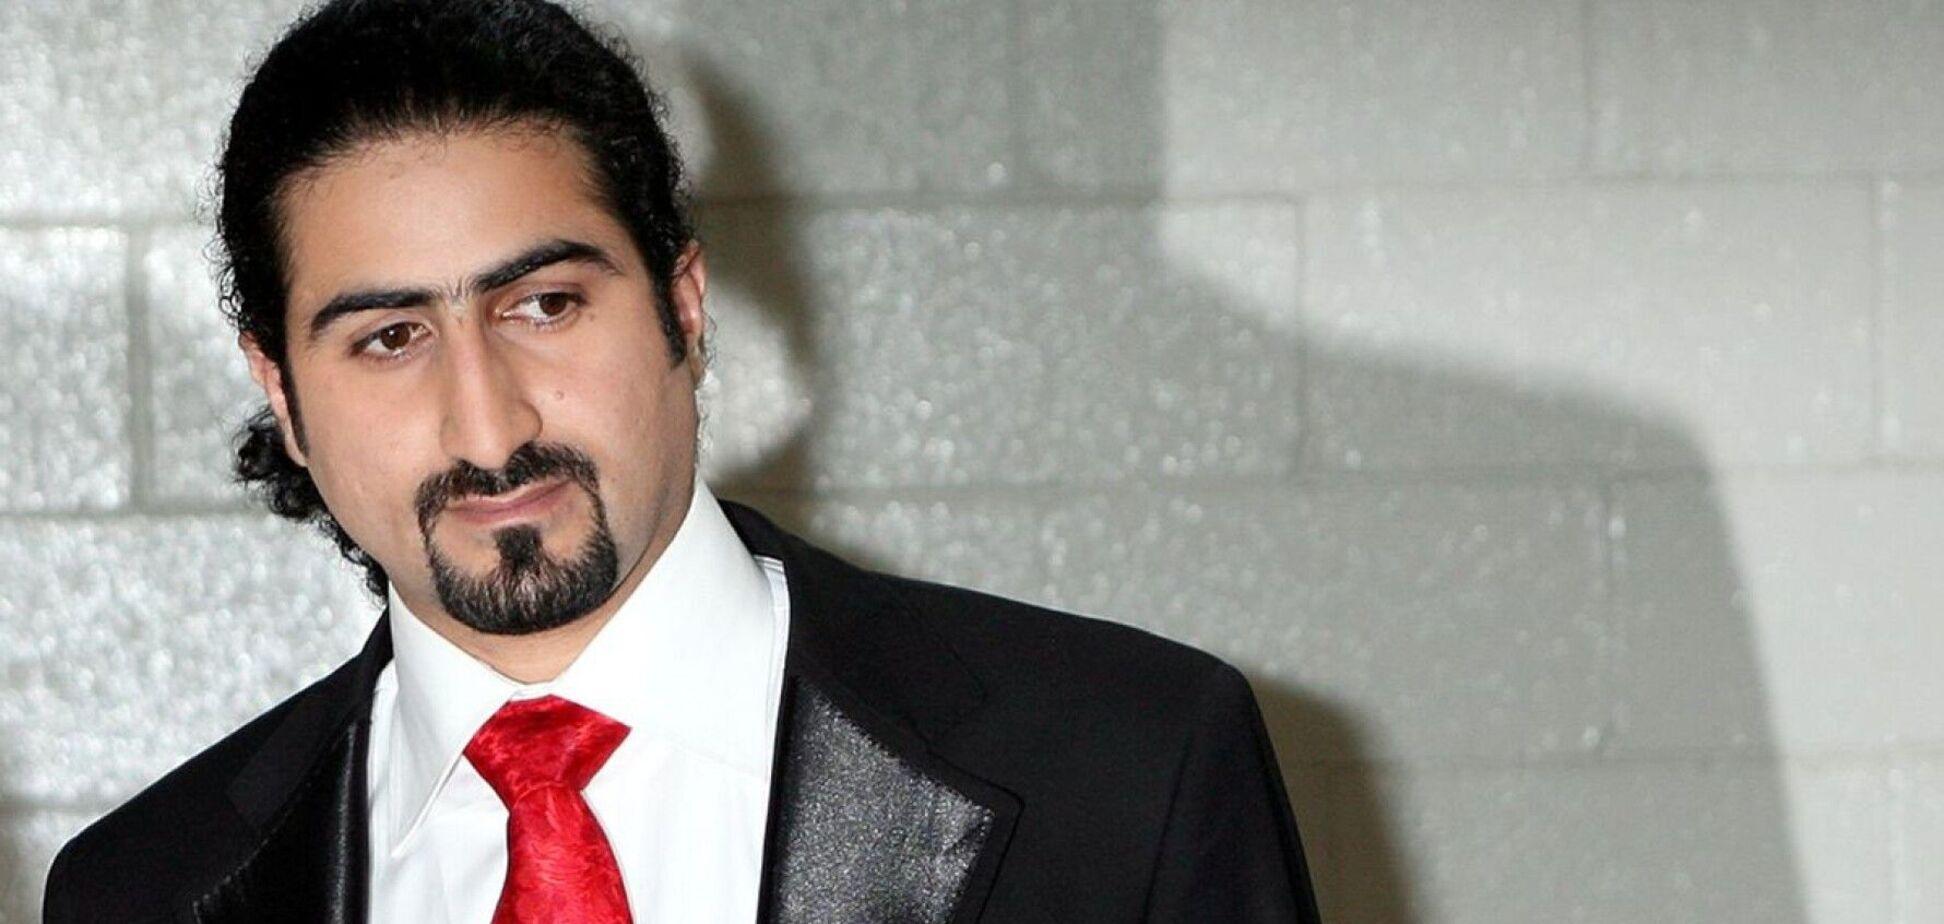 Син Усами бен Ладена написав десятки картин, які показав вперше